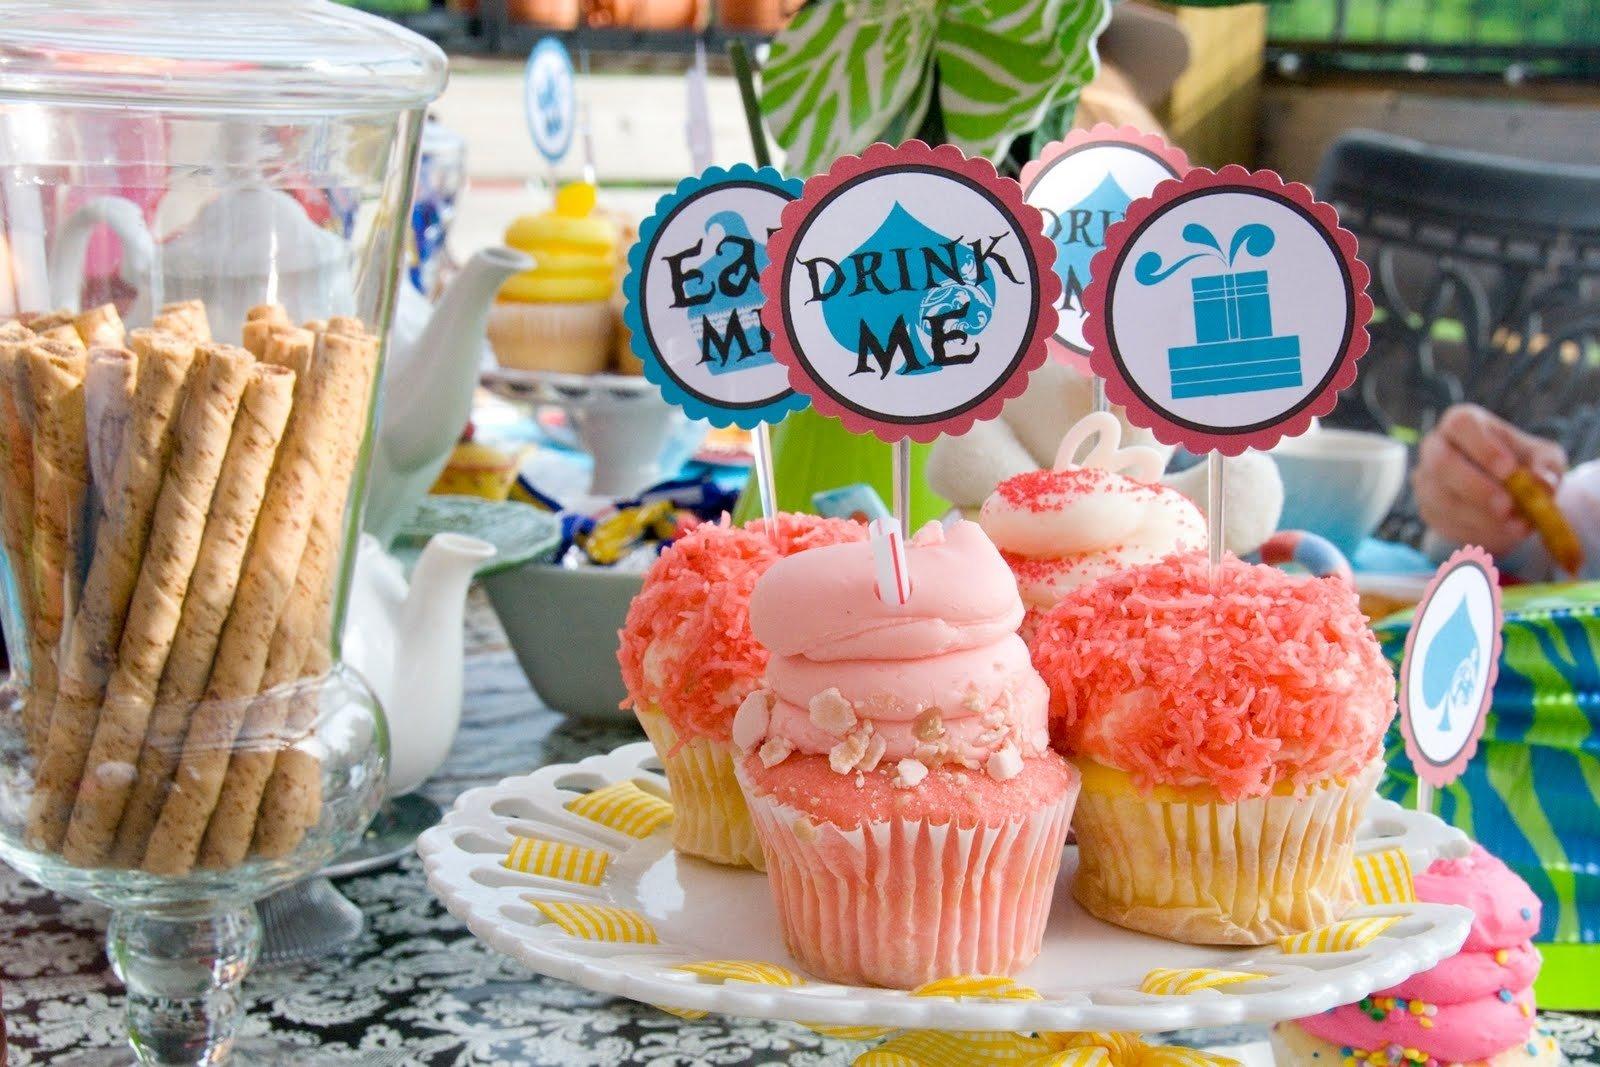 10 Elegant Alice In Wonderland Party Food Ideas alice in wonderland party ideas 2 2021